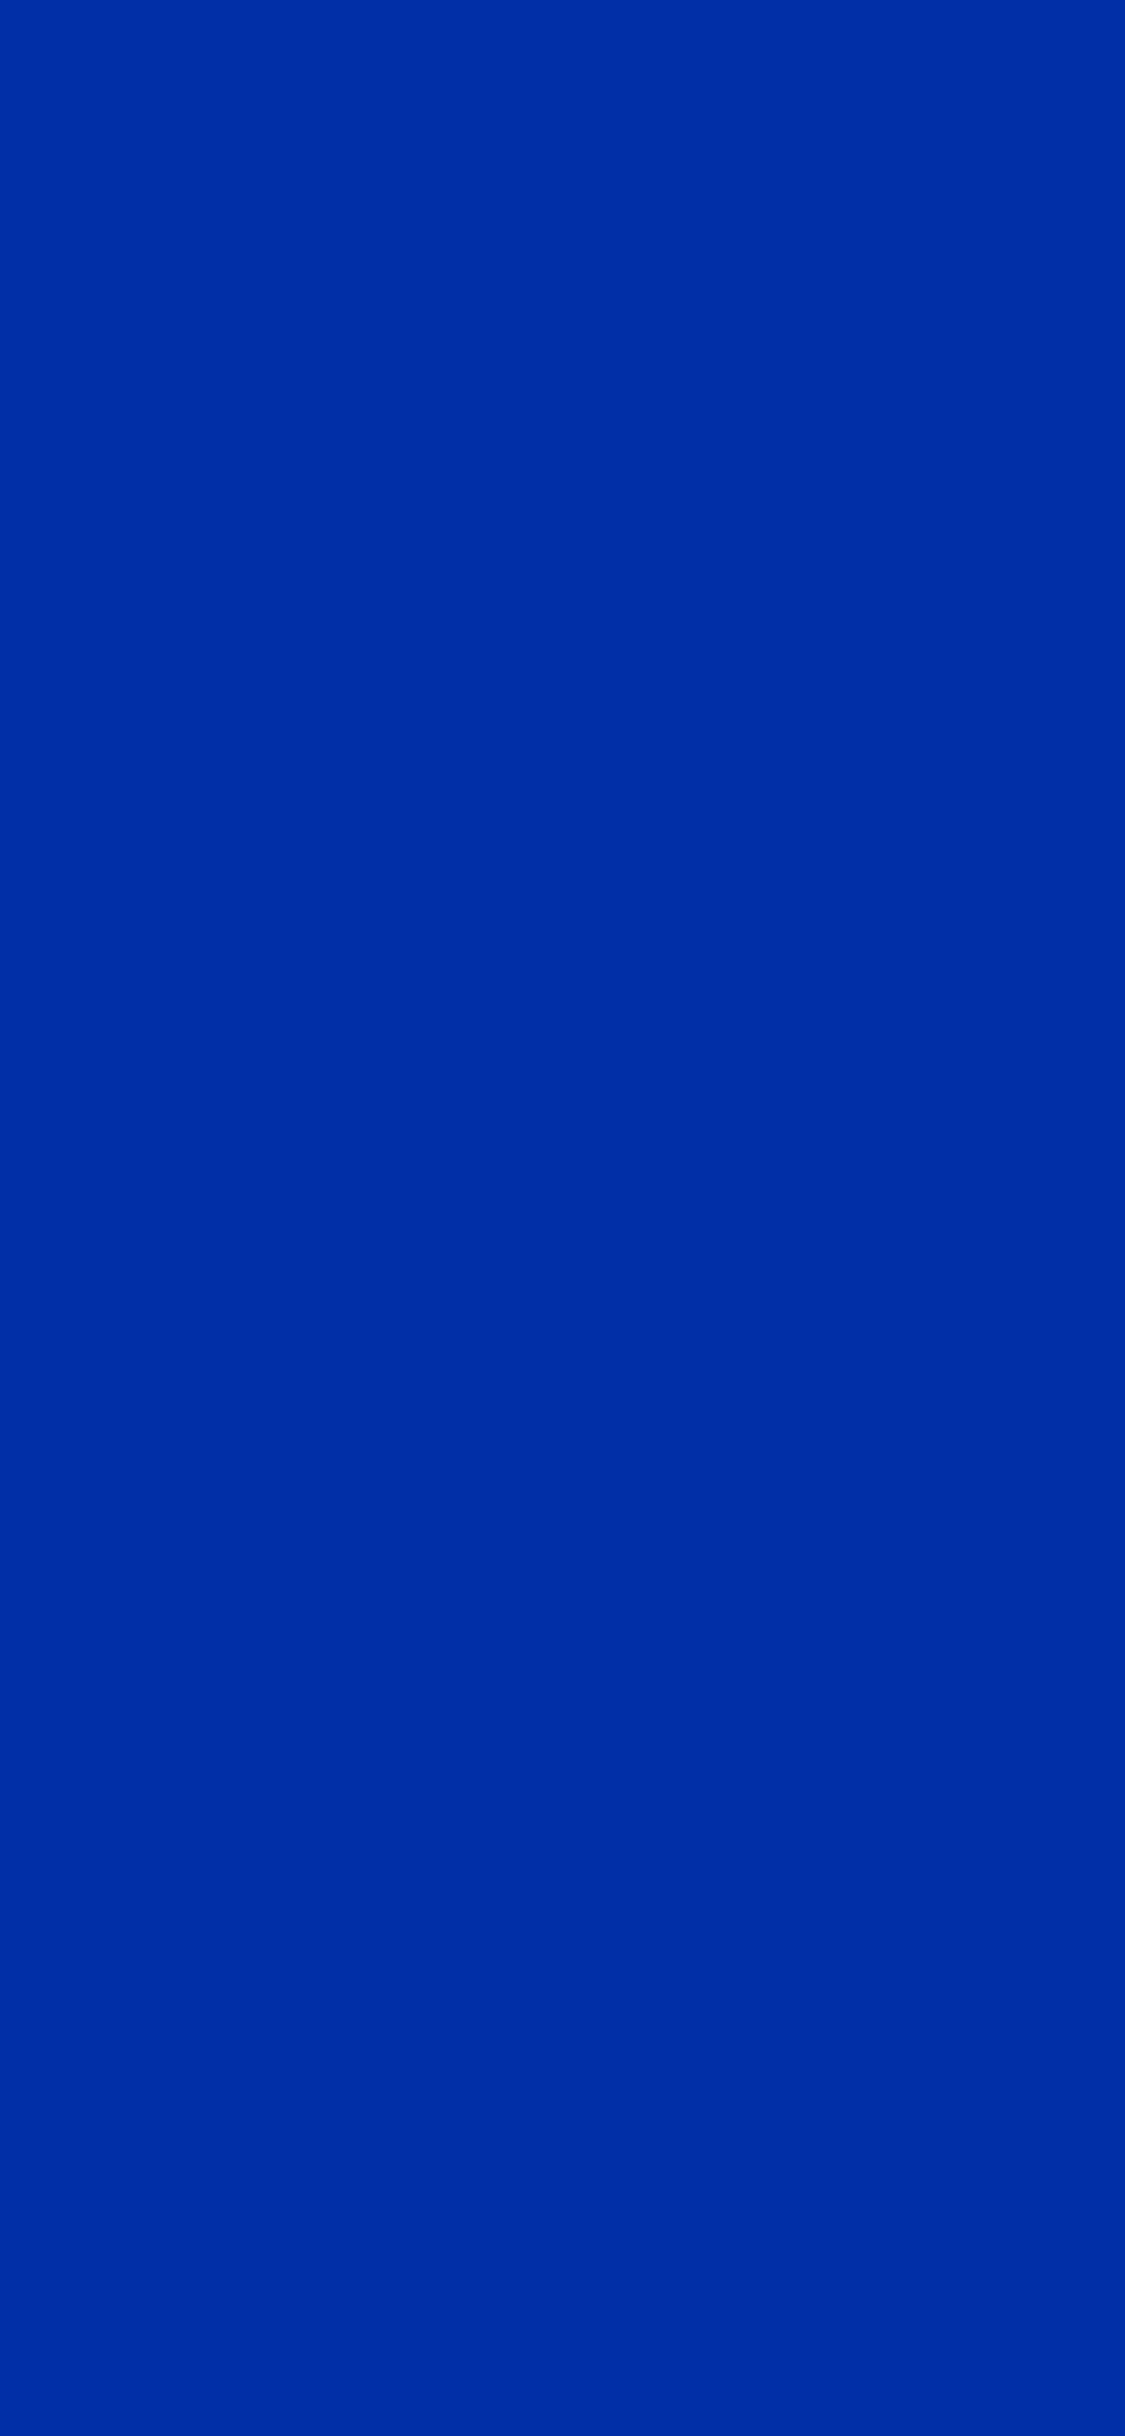 1125x2436 International Klein Blue Solid Color Background